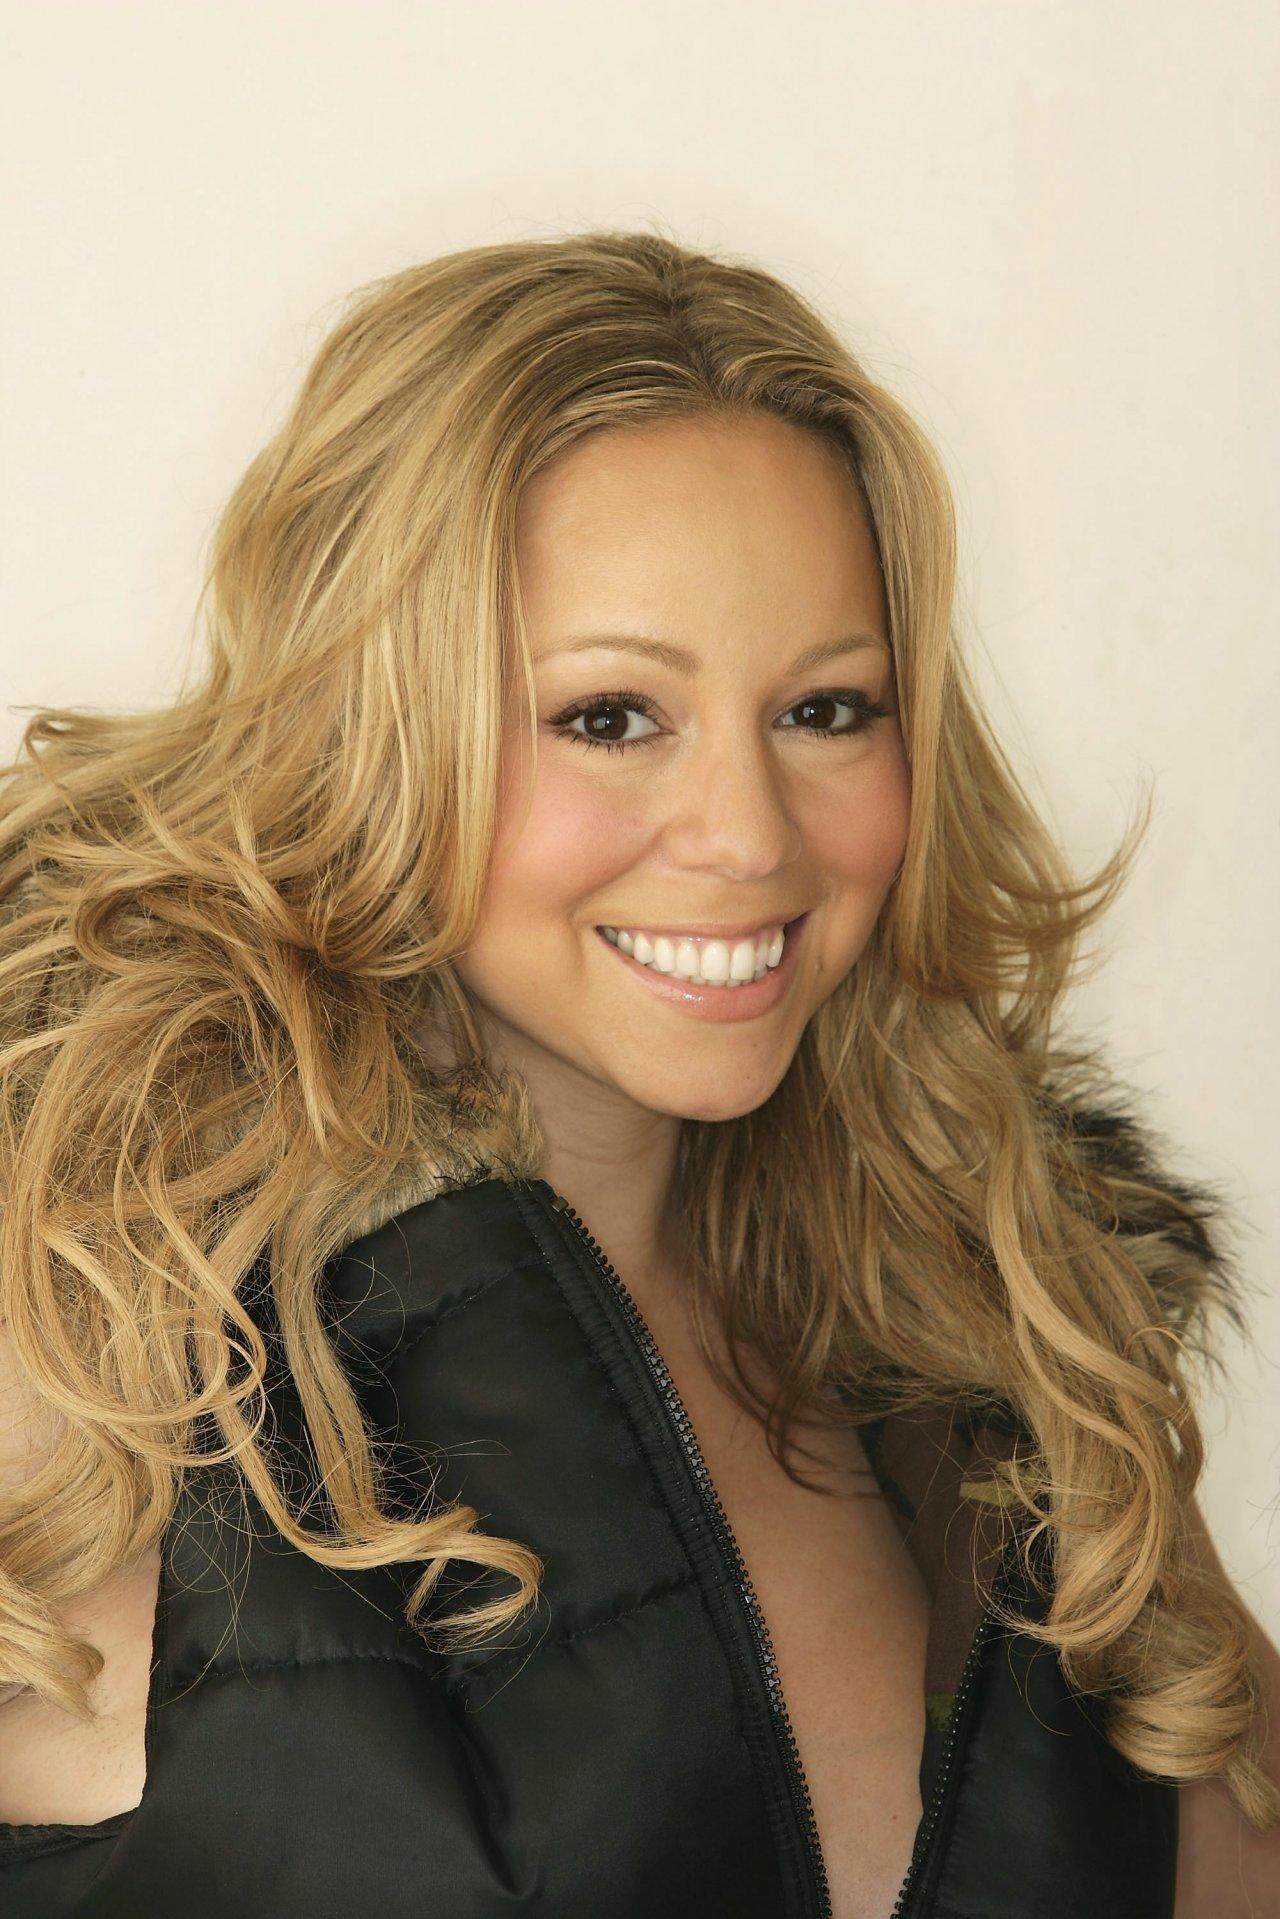 Mariah Carey leaked wallpapers